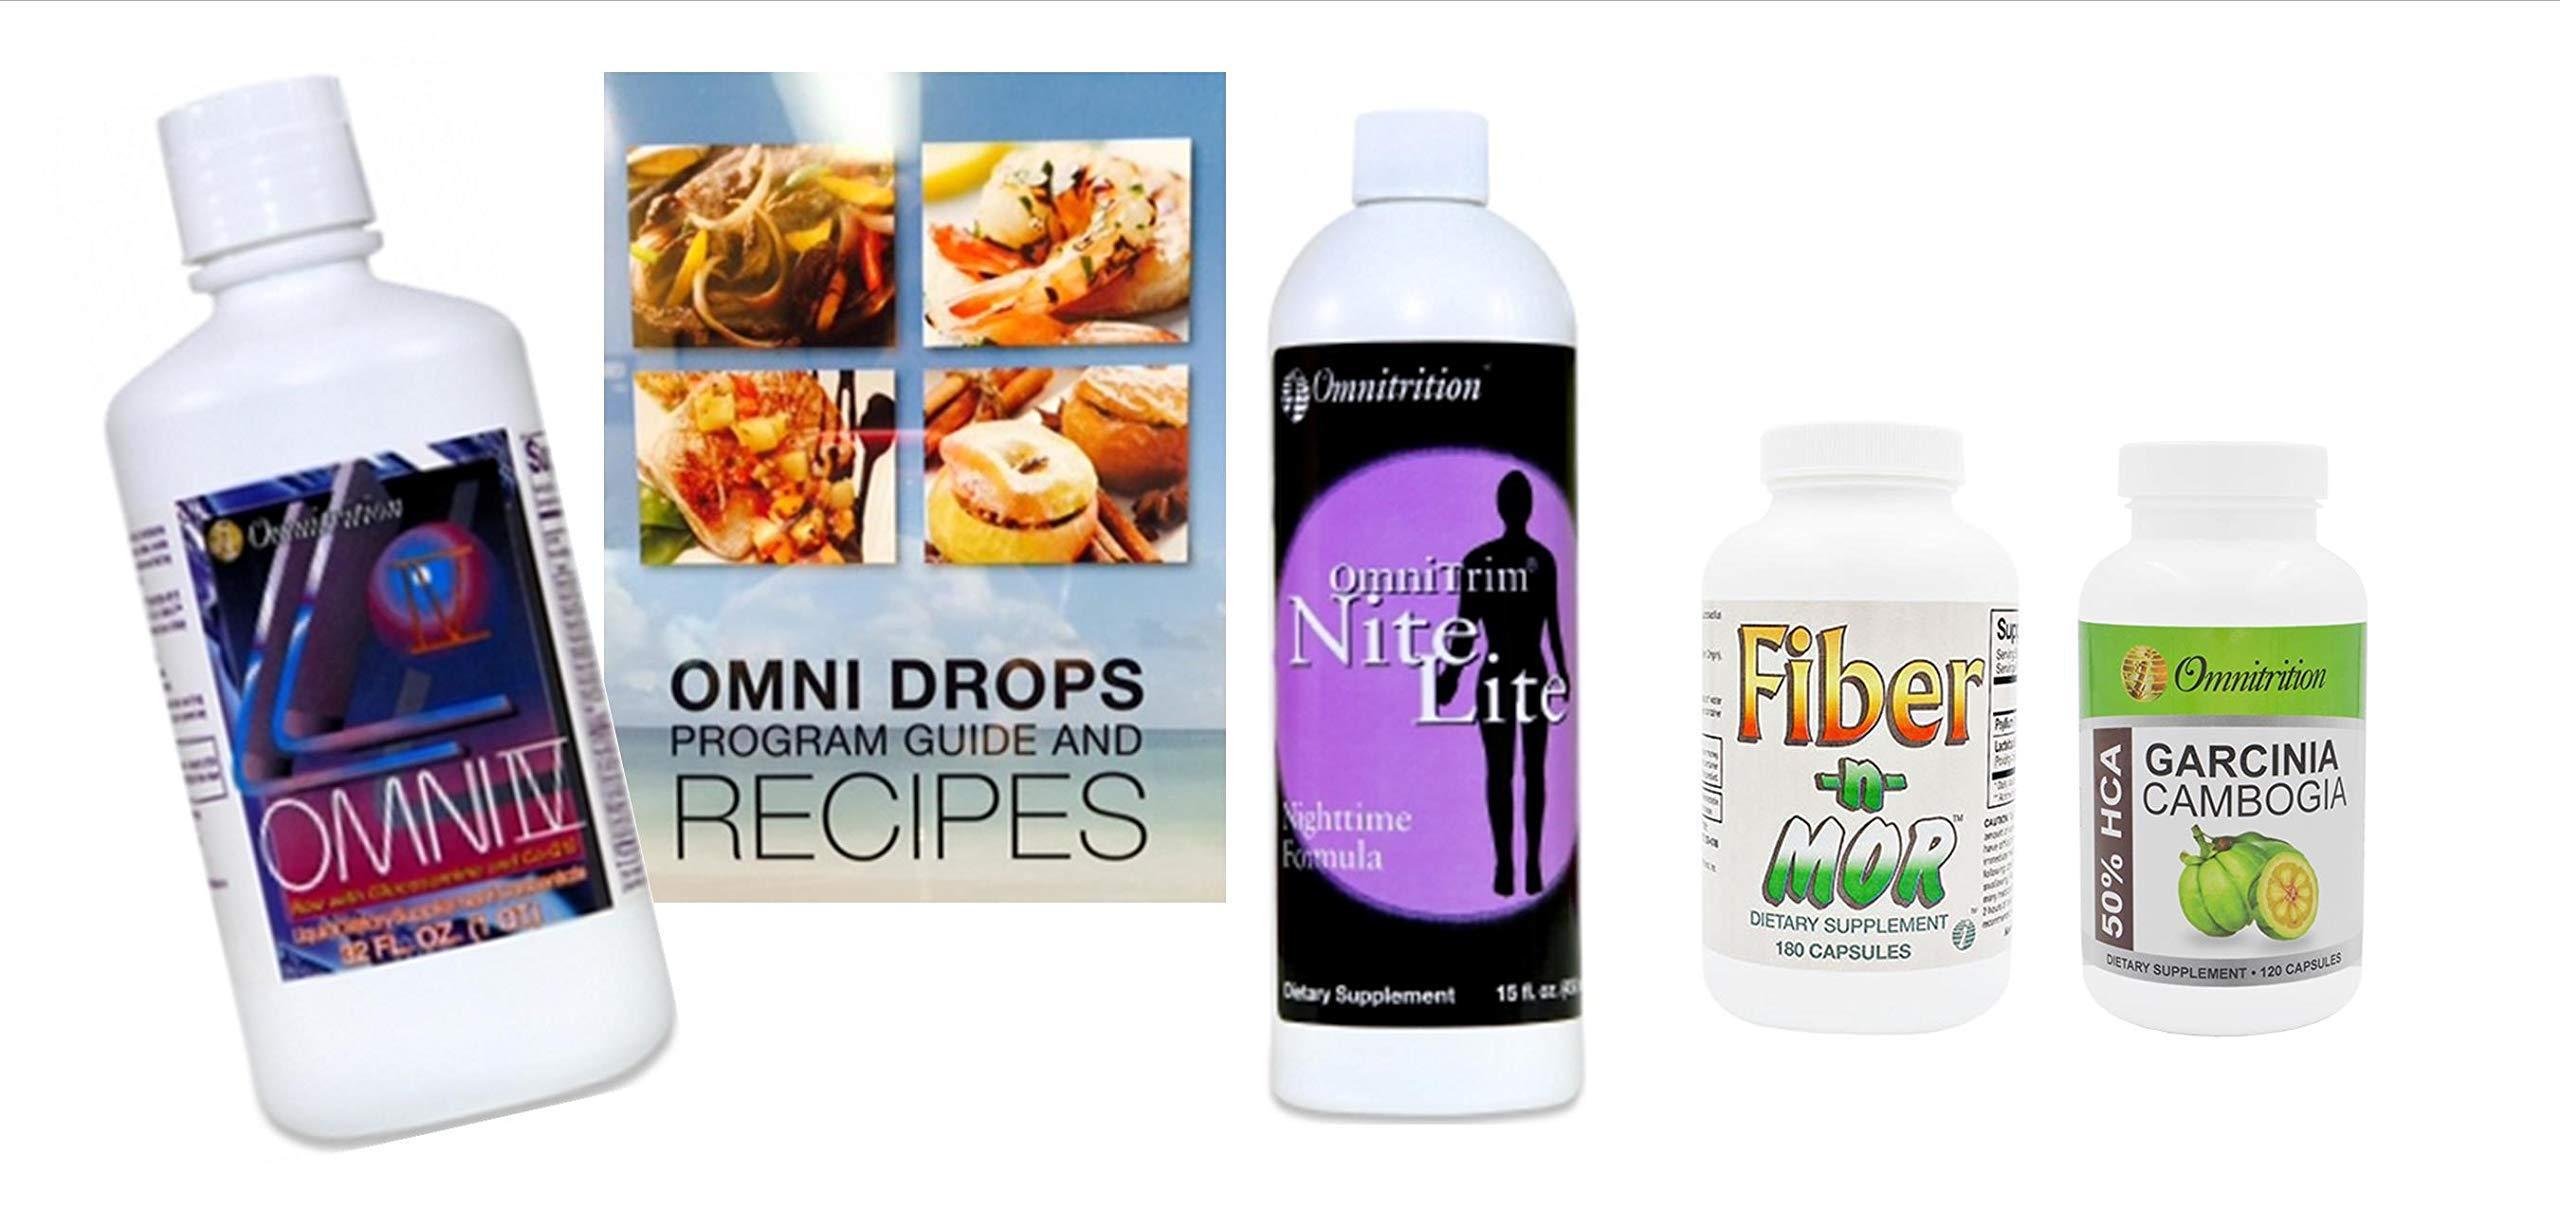 Omni Drop Program Bundle *Fab4 + GC* (Includes: Omni Drops w/Program Guide, Omni IV w/Glucosamine, OmniTrim Nite Lite, Fiber n Mor and Garcinia Cambogia Extract) by Omnitrition IMA, Authorized Distributor 66351